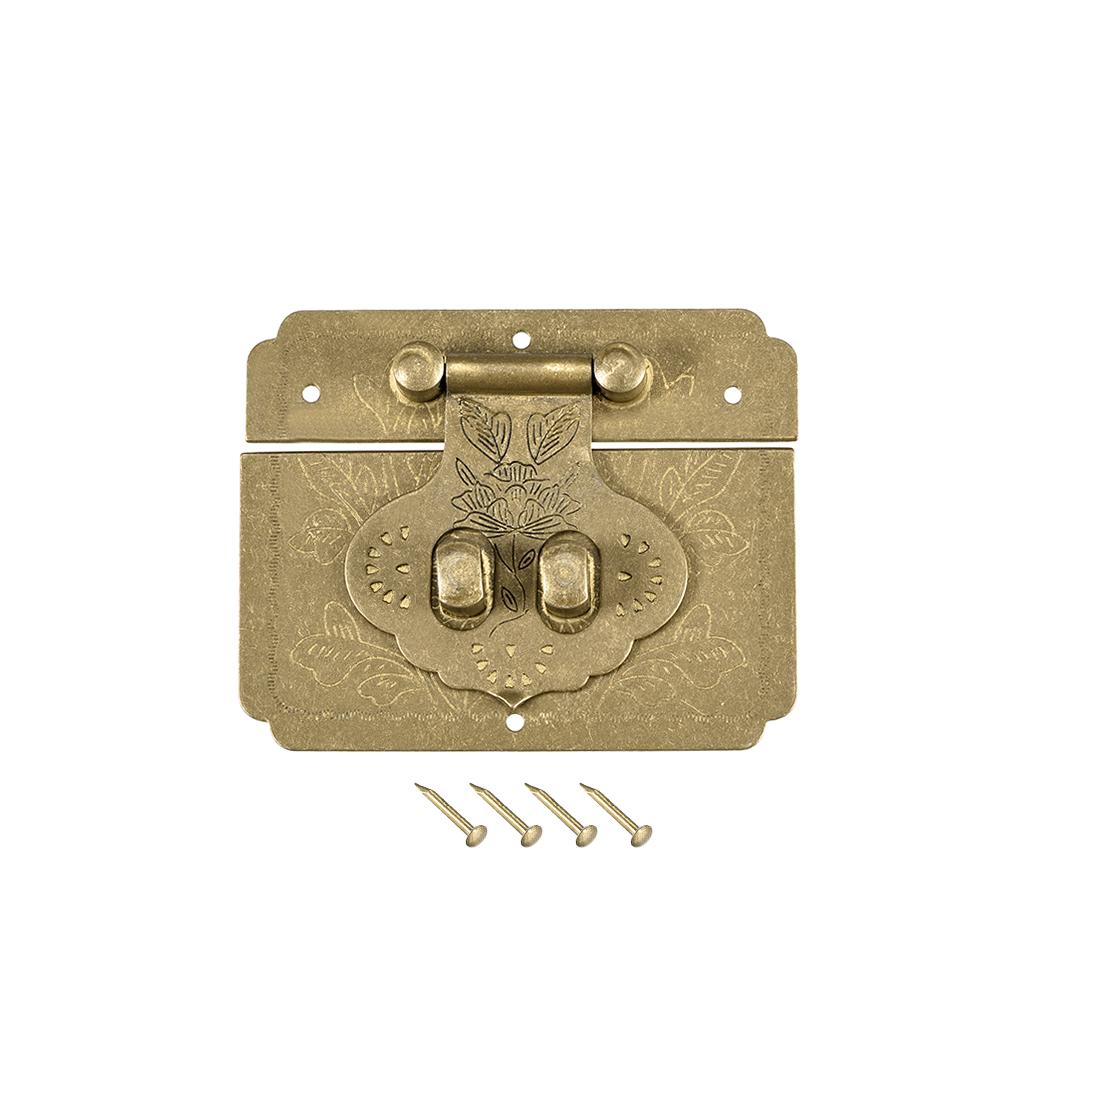 Wood Case Box Rectangle Hasp 65x52mm Closure Brass Antique Latches Bronze, 2 Pcs